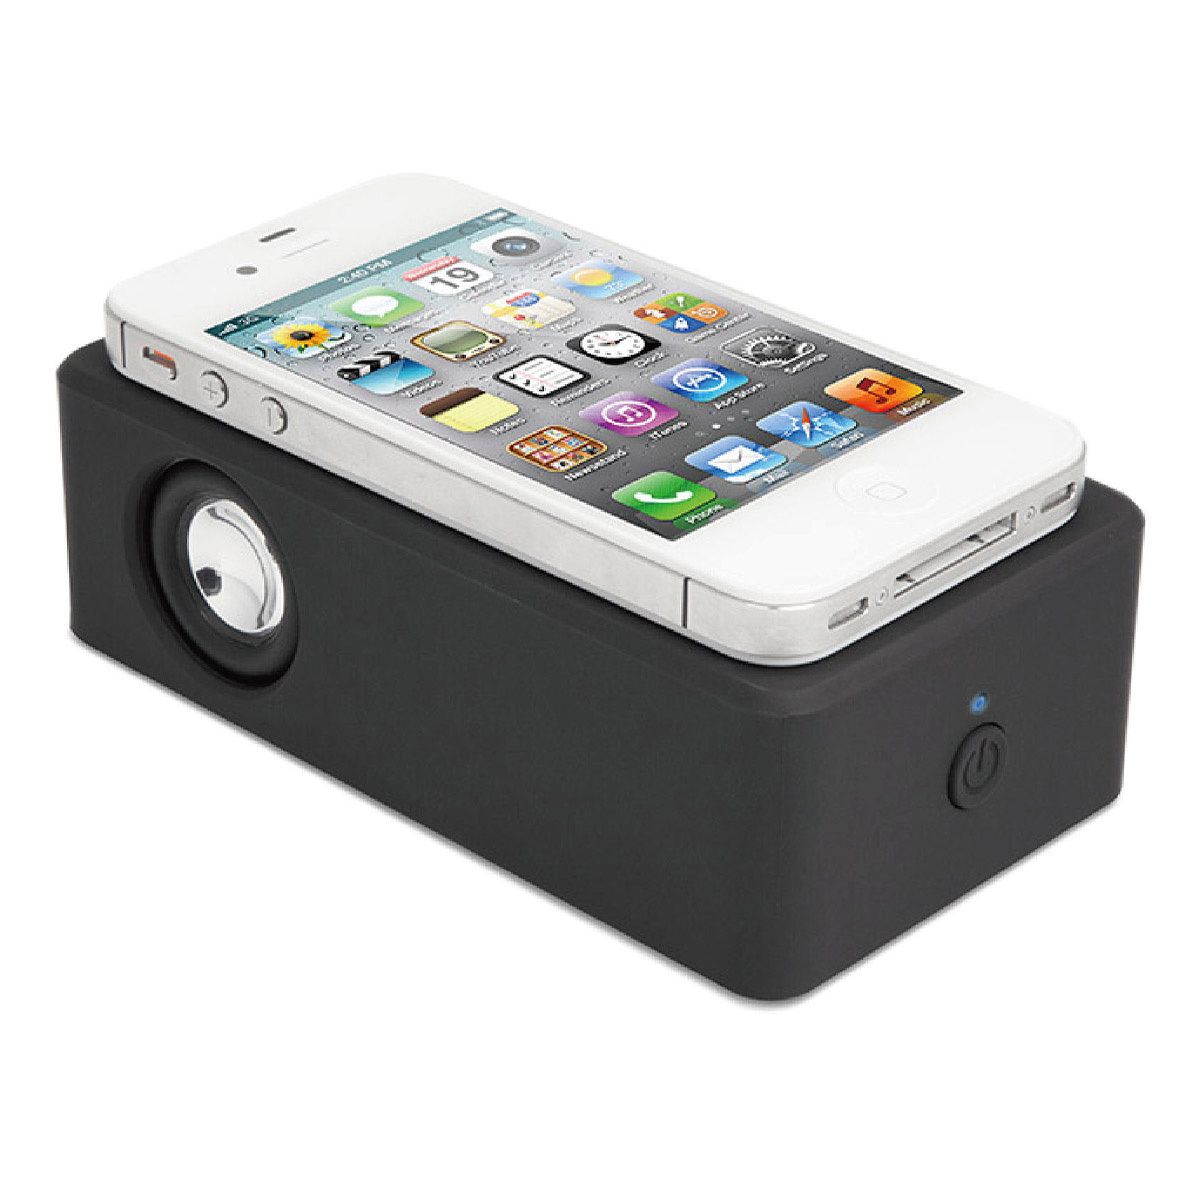 98-1109-04-mobiler-lautsprecher-für-smartphones-touchplay-chillout-anwendung2-1200x1200px.jpg